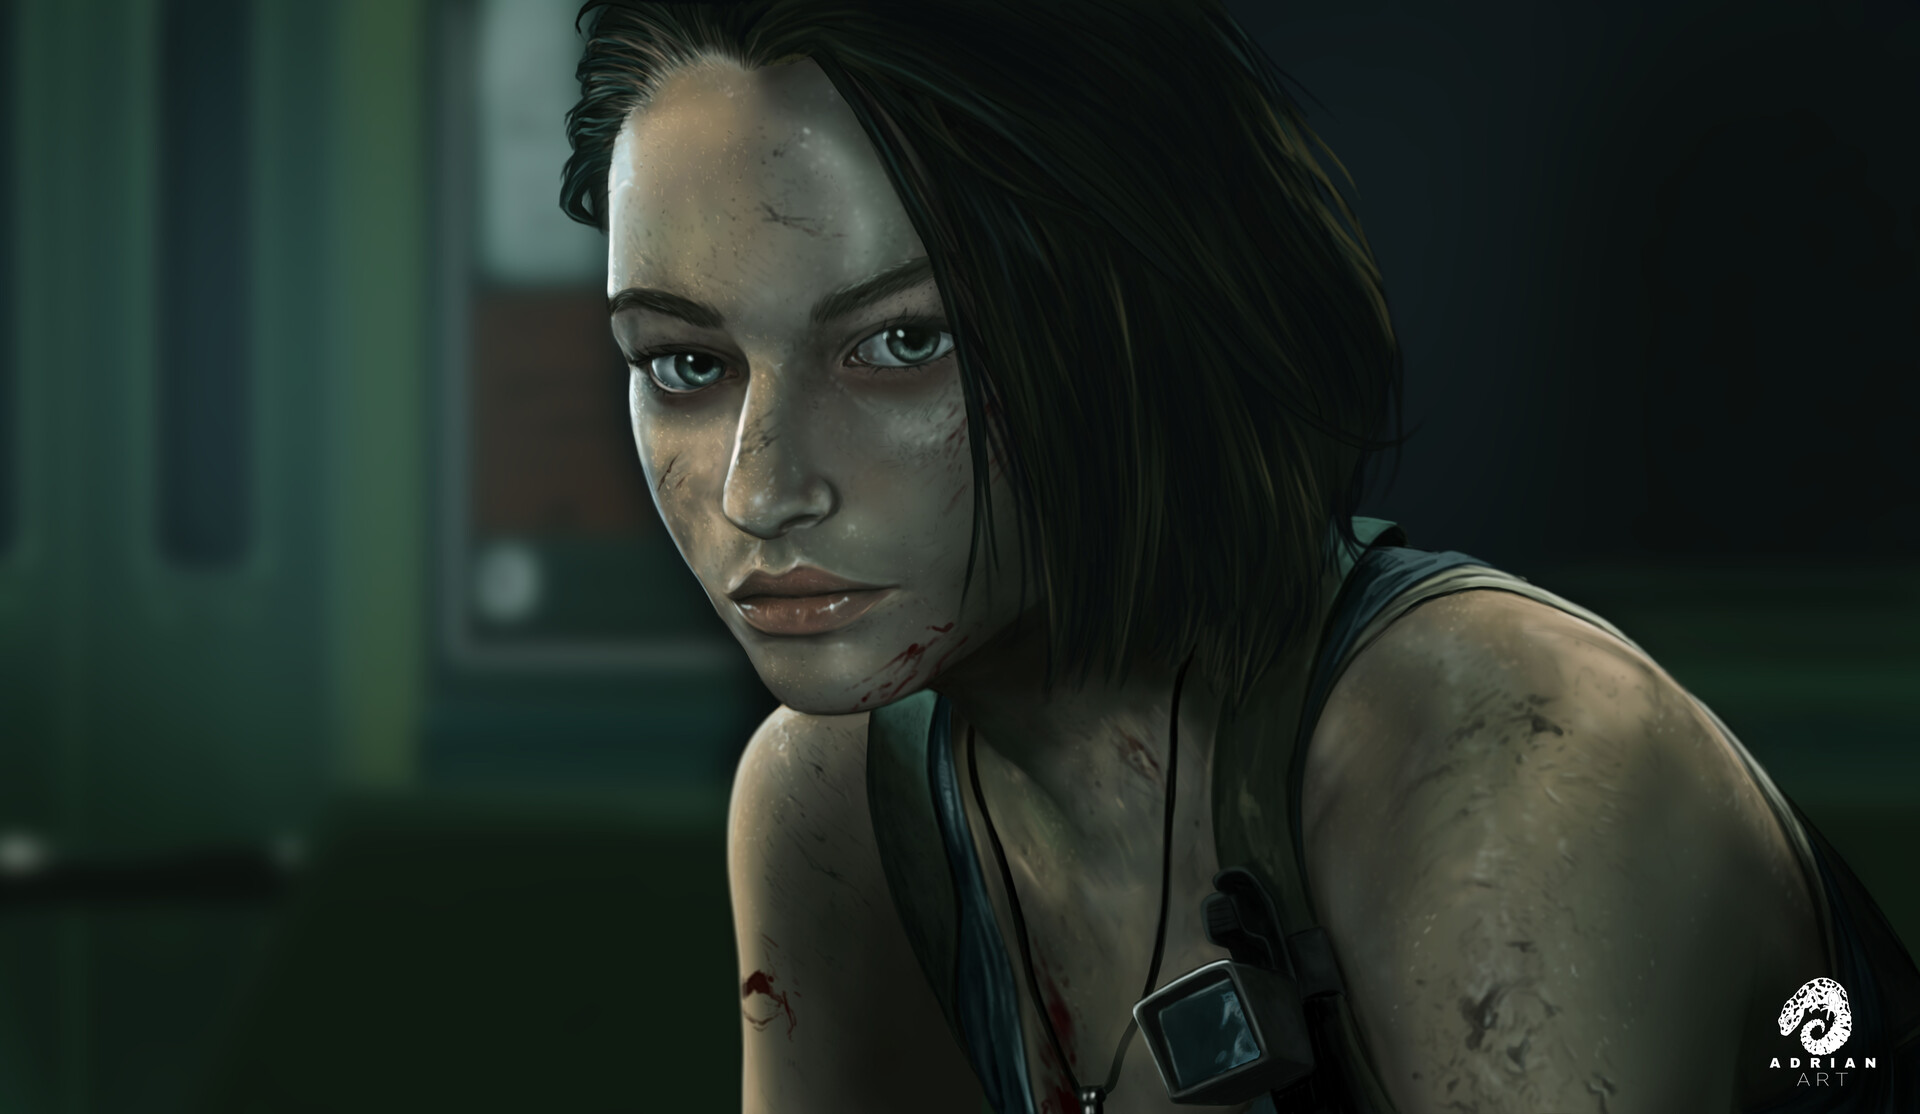 Artstation Jill Valentine Portrait Sasha Zotova Resident Evil 3 Remake Speedpainting Adrianart Digital